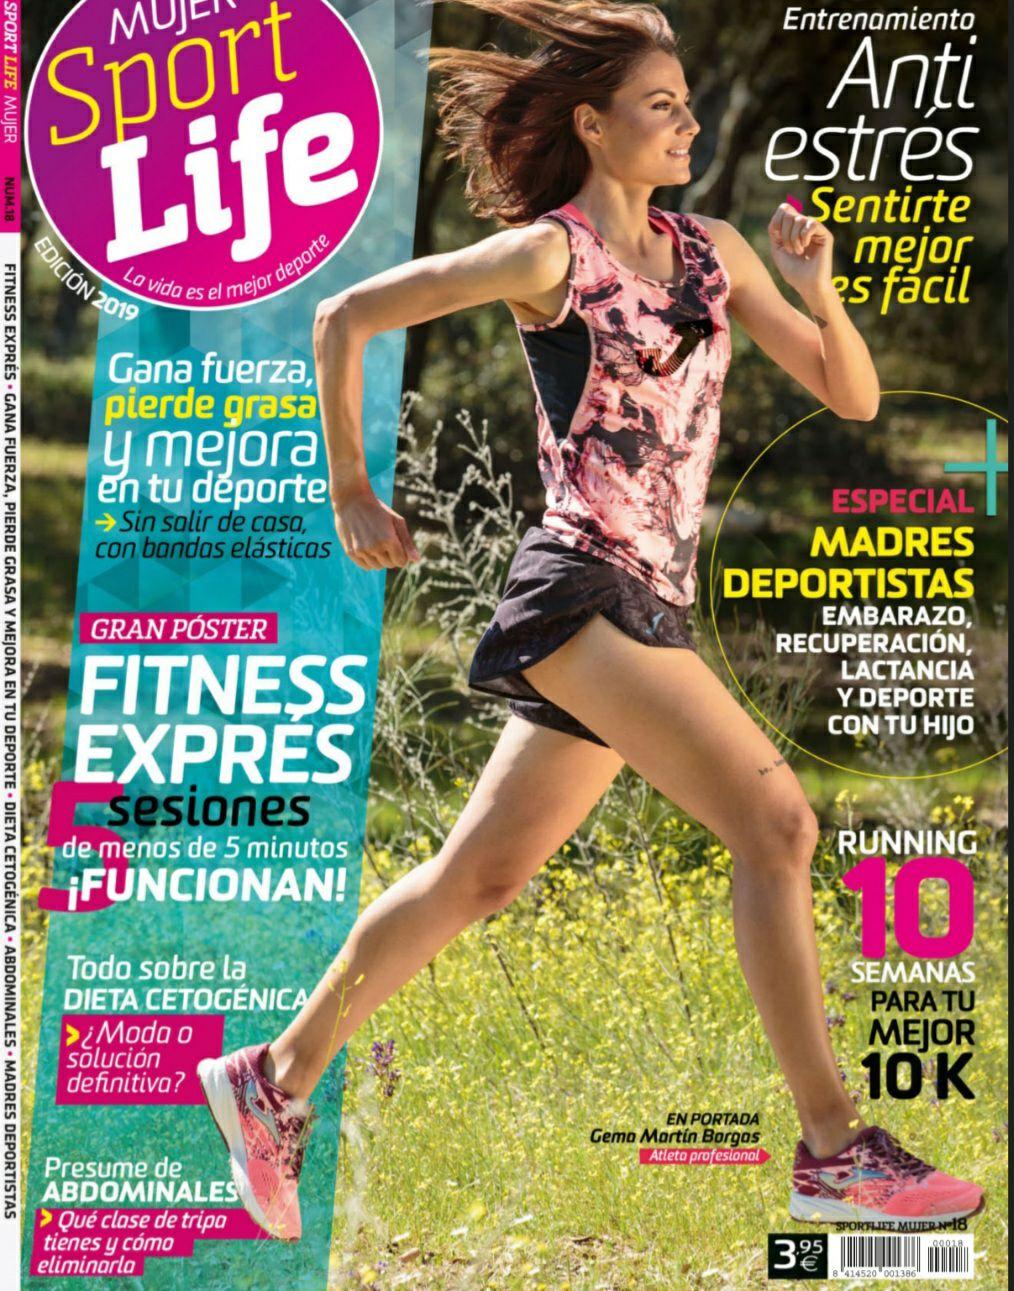 Sport Life Mujer GRATIS (Dia Internacional de la Mujer)